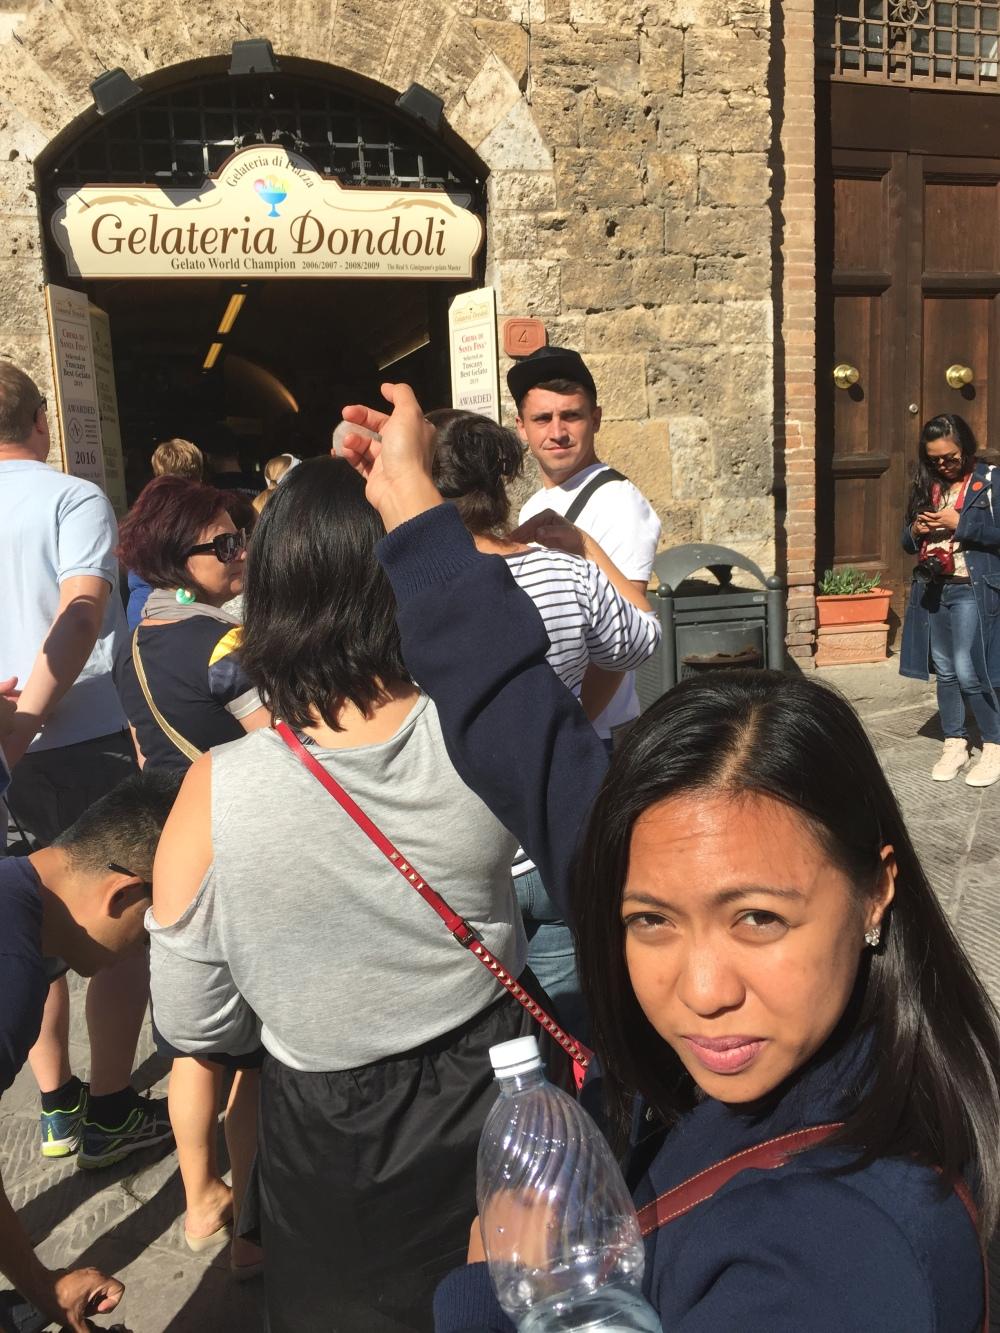 gelataria-dondori-line-san-gimignano-travelanyway